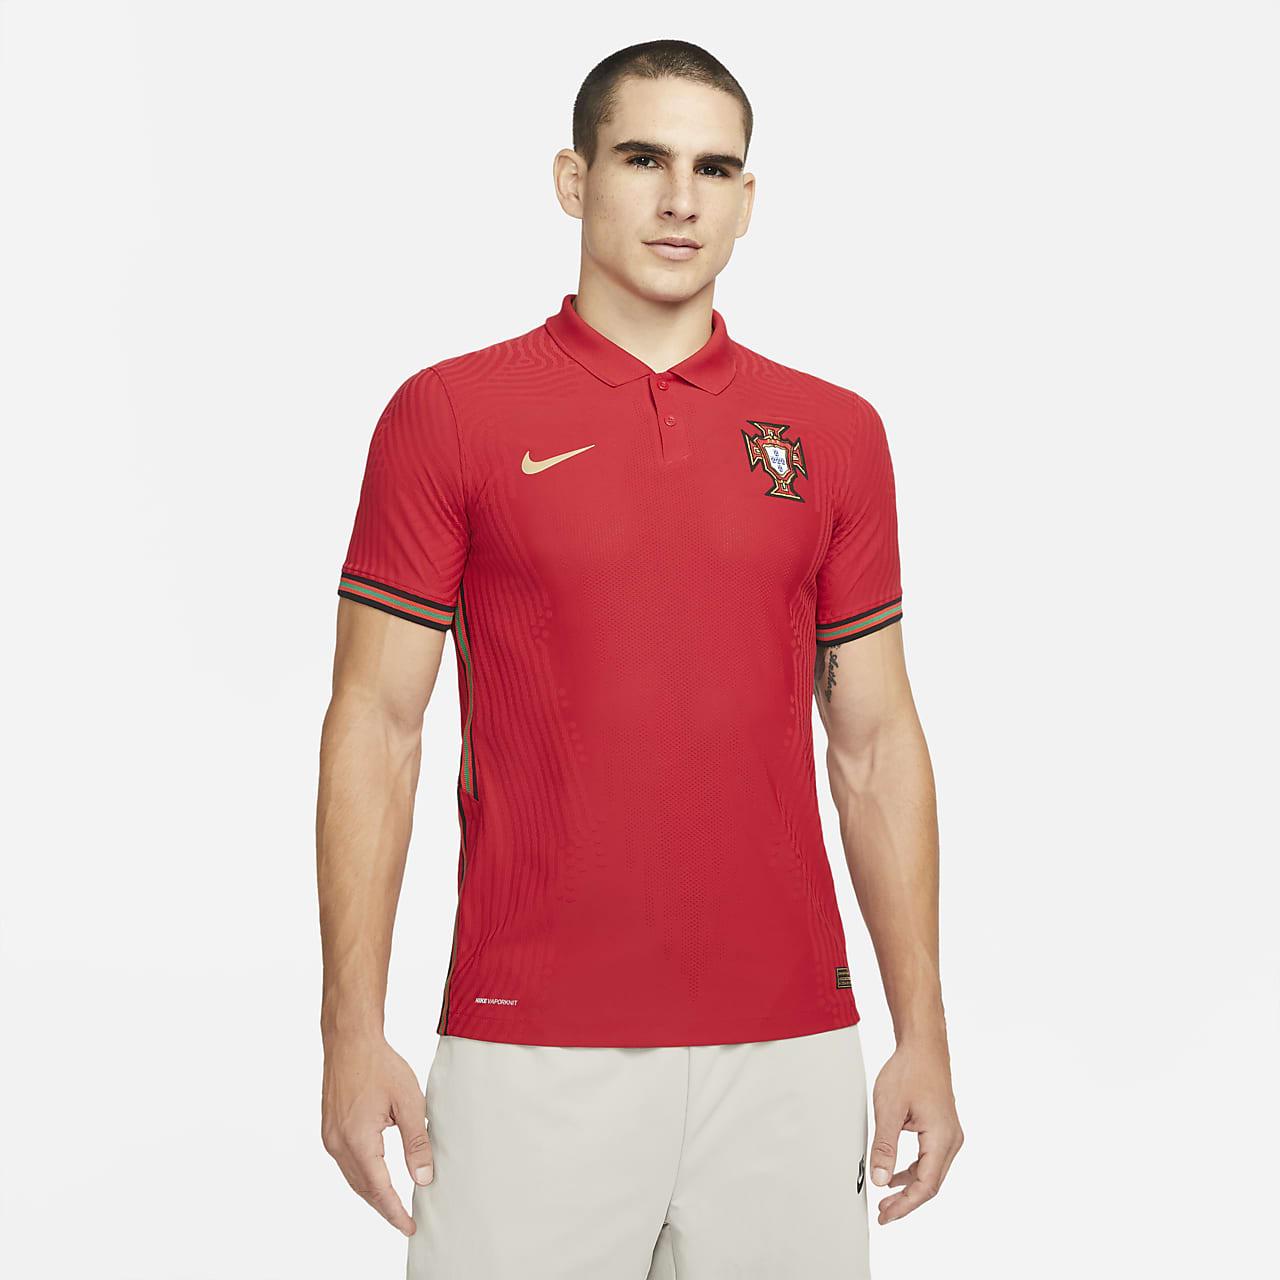 Respeto a ti mismo Cuerpo Deliberadamente  Camiseta de fútbol de local para hombre Vapor Match de Portugal 2020. Nike .com